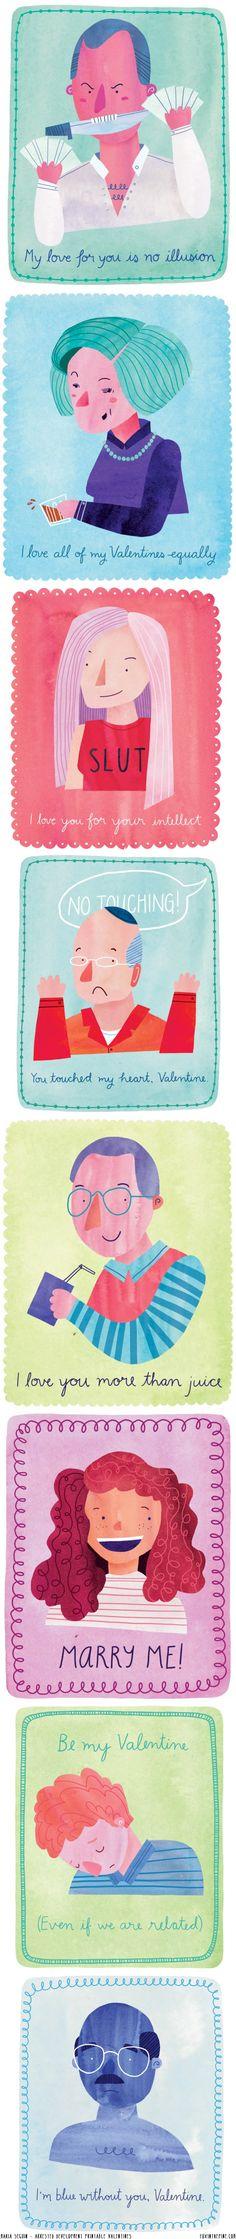 Arrested Development free printable Valentines by Marisa Seguin   //   FOXINTHEPINE.COM